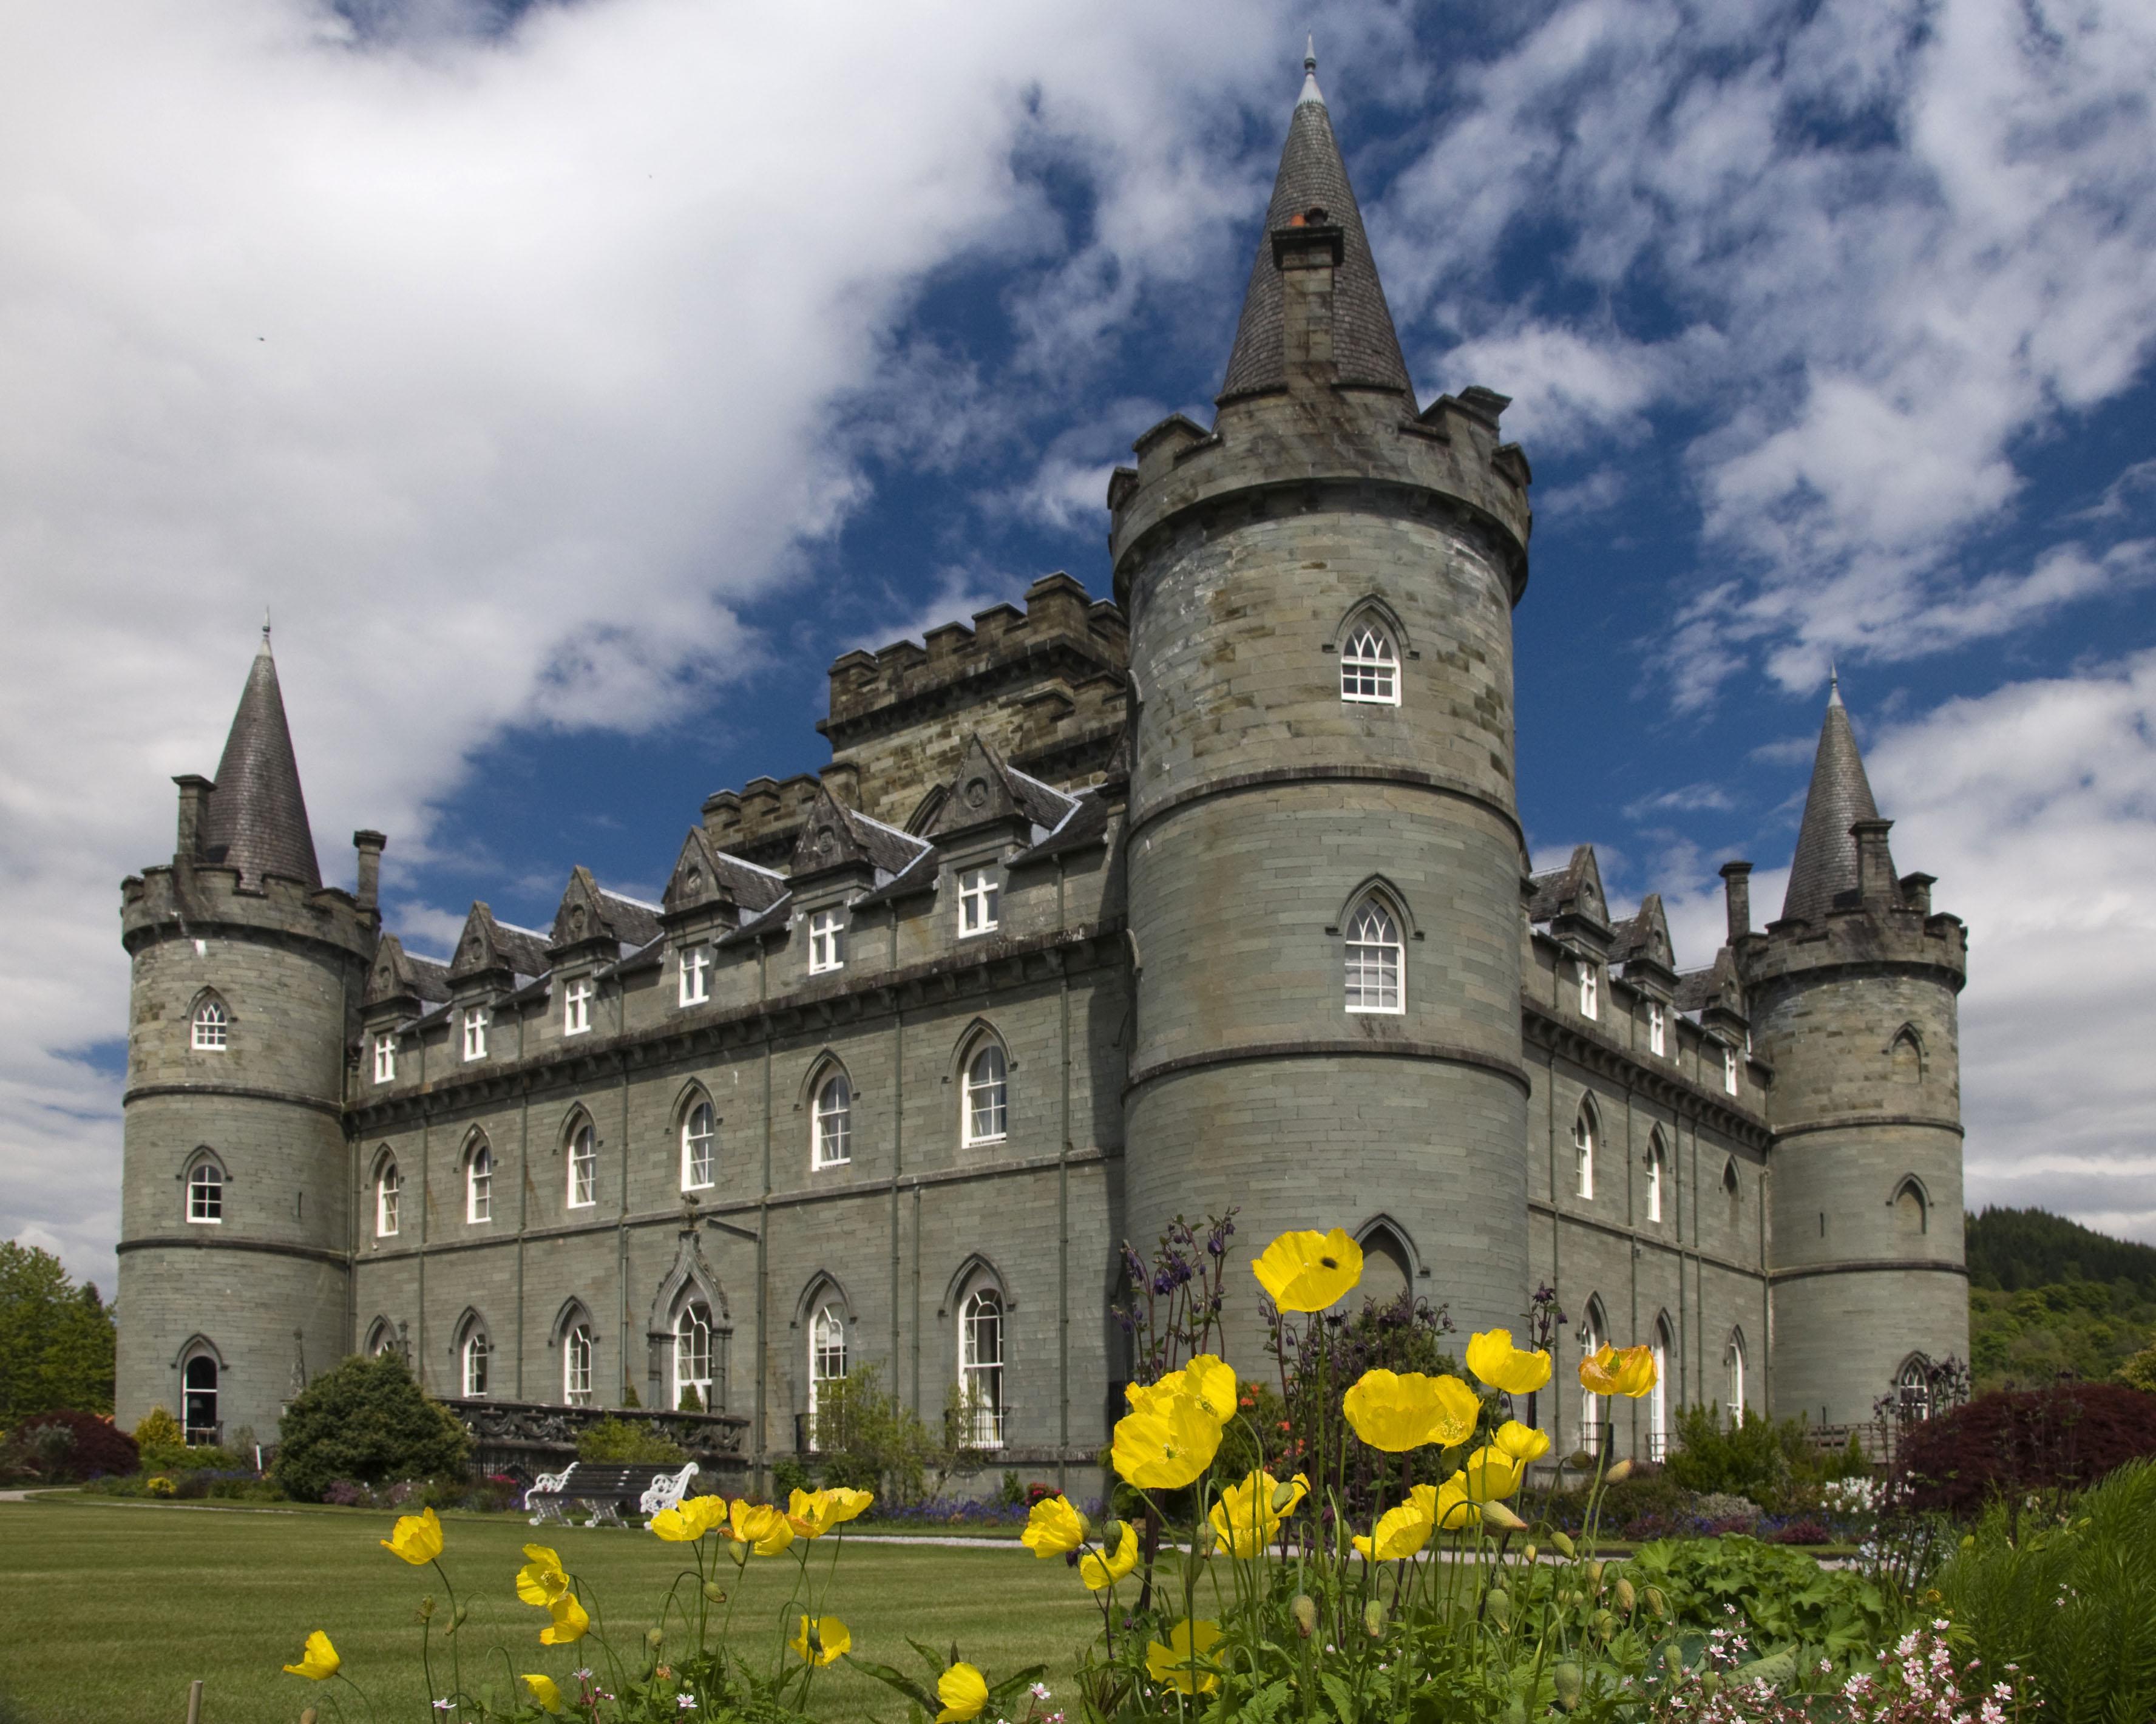 Heading to Scotland, Outlander Style